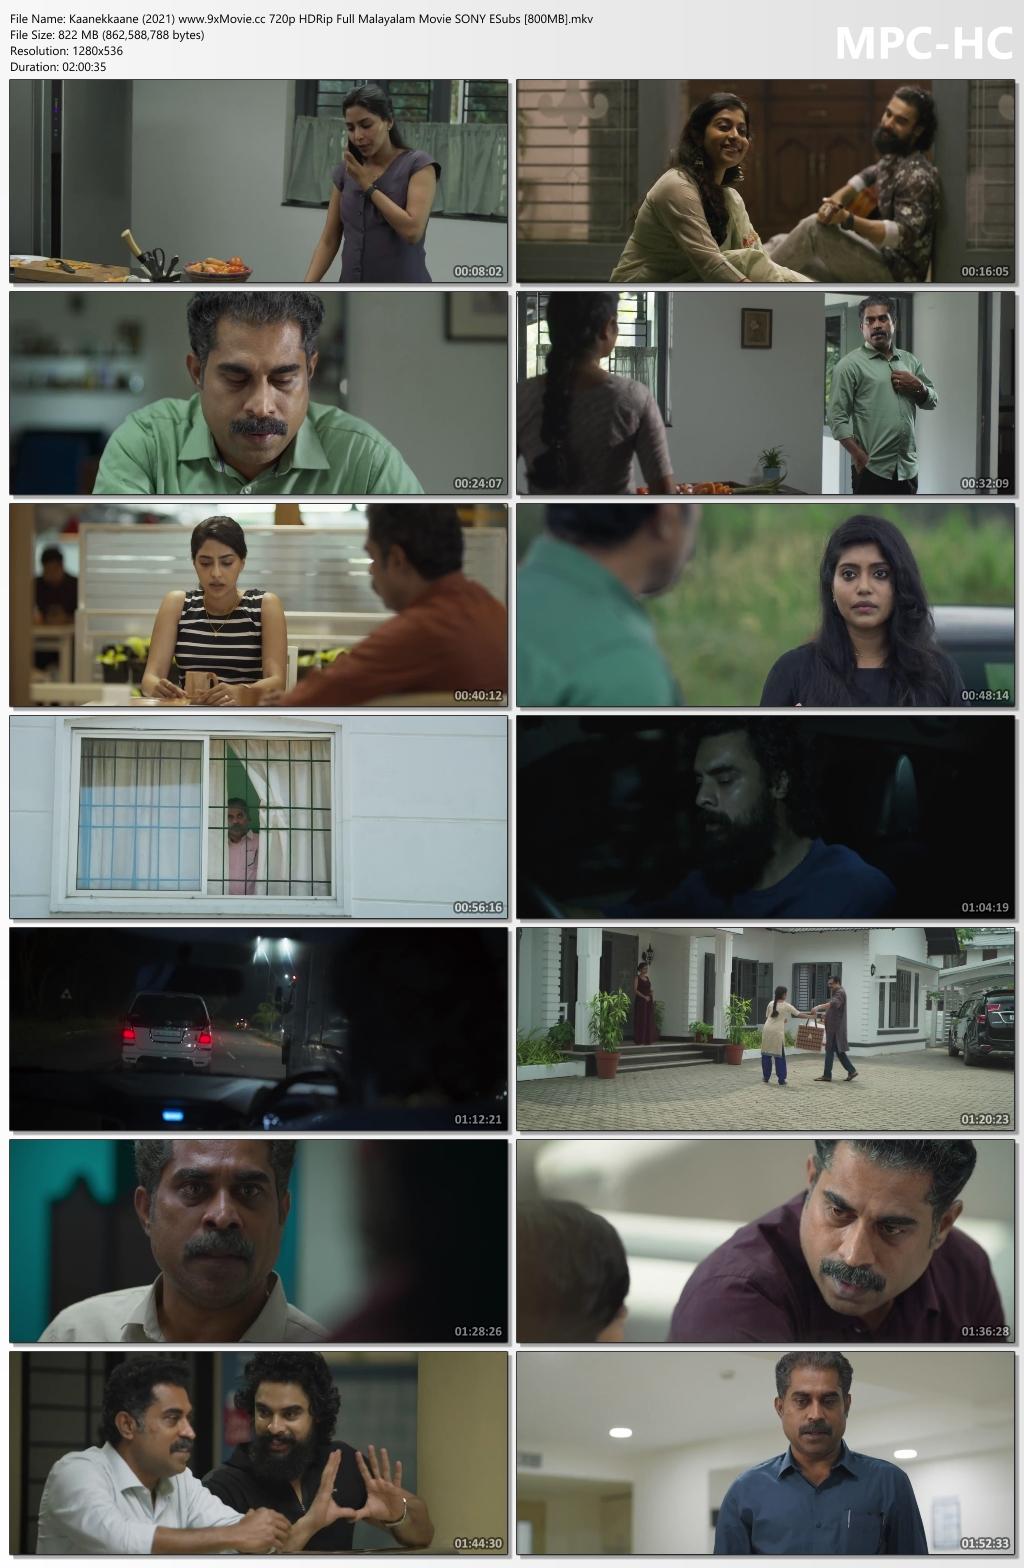 Kaanekkaane-2021-www-9x-Movie-cc-720p-HDRip-Full-Malayalam-Movie-SONY-ESubs-800-MB-mkv